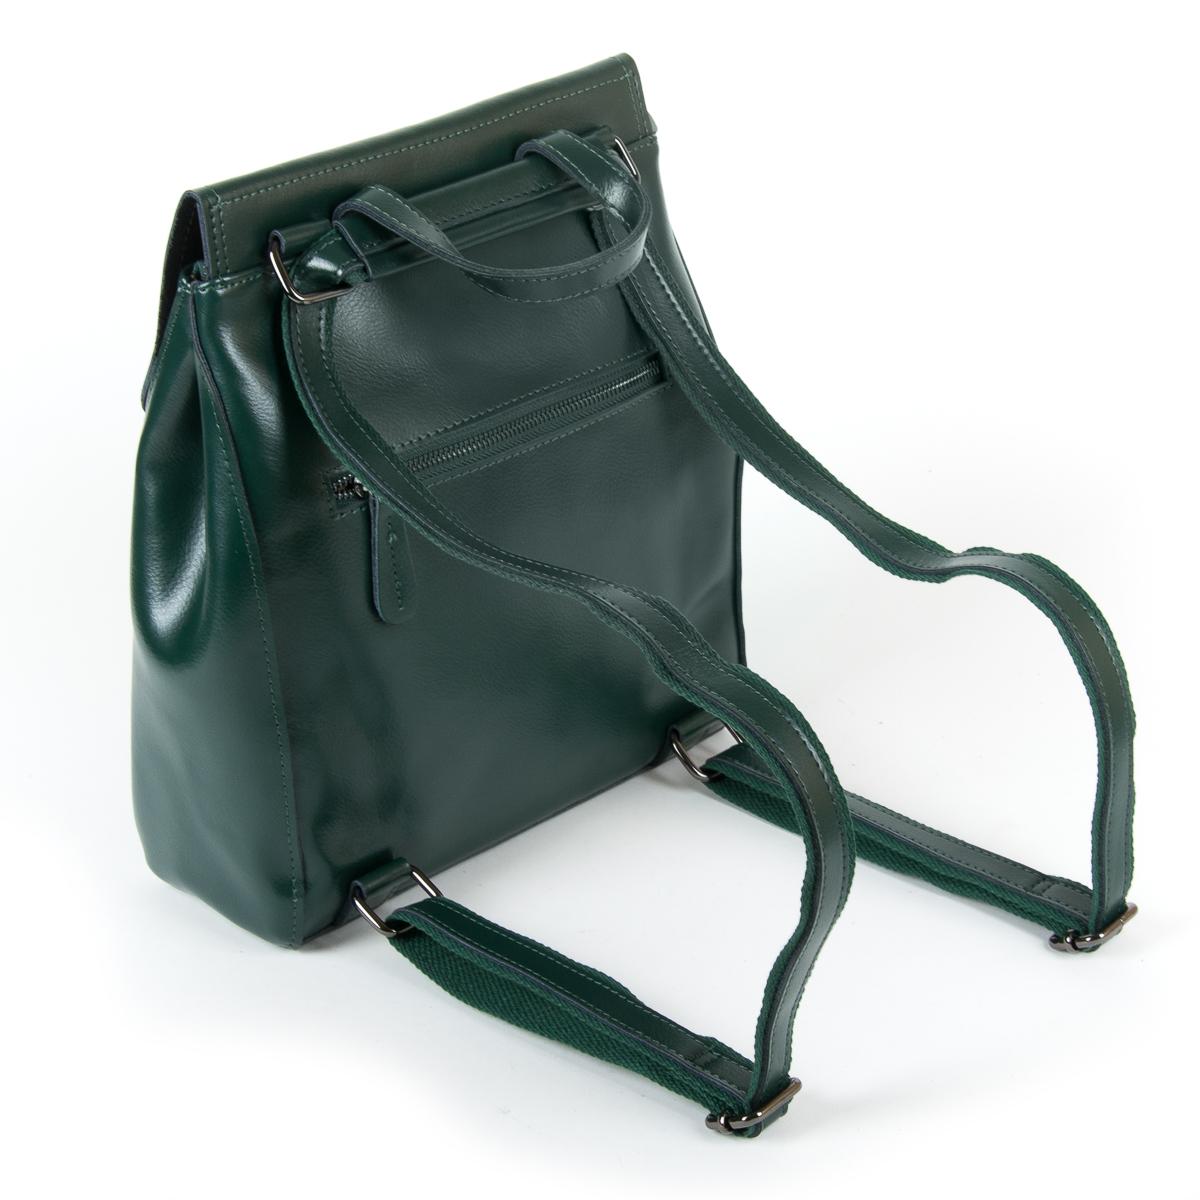 Сумка Женская Рюкзак кожа ALEX RAI 9-01 1005 green - фото 4